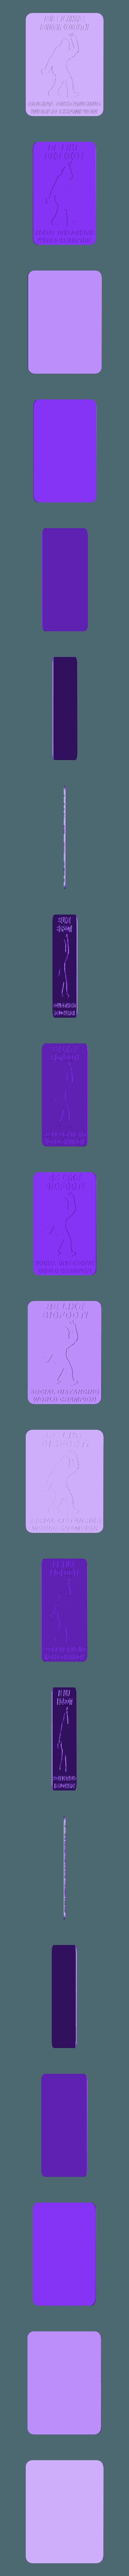 bigfoot_peace_sign.stl Download free STL file BE LIKE BIGFOOT! SOCIAL DISTANCING WORLD CHAMPION, sign (Coronavirus) • 3D printing model, becker2